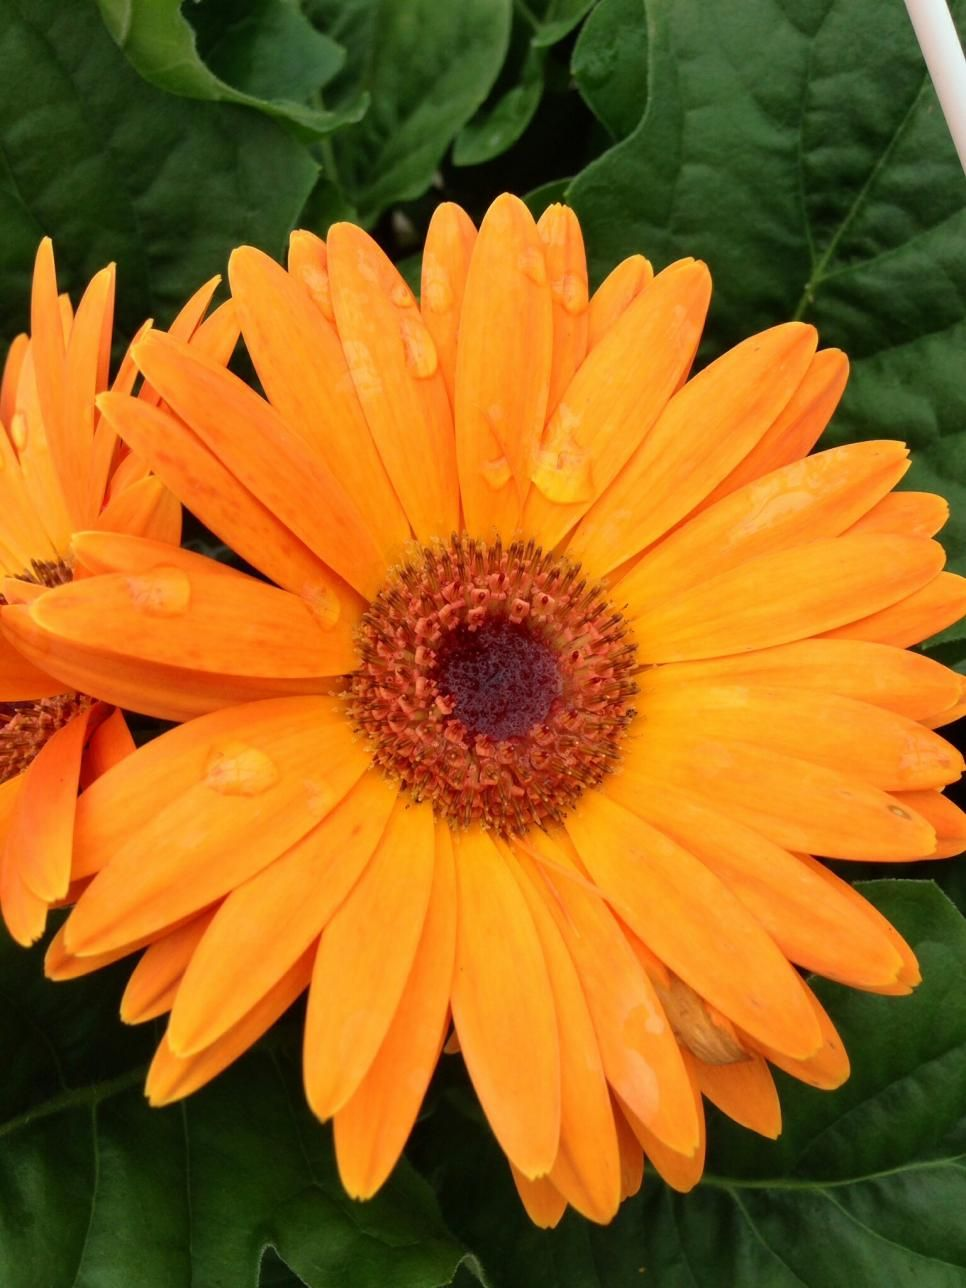 Top Orange Annual Flowers For Your Garden Garden Pinterest